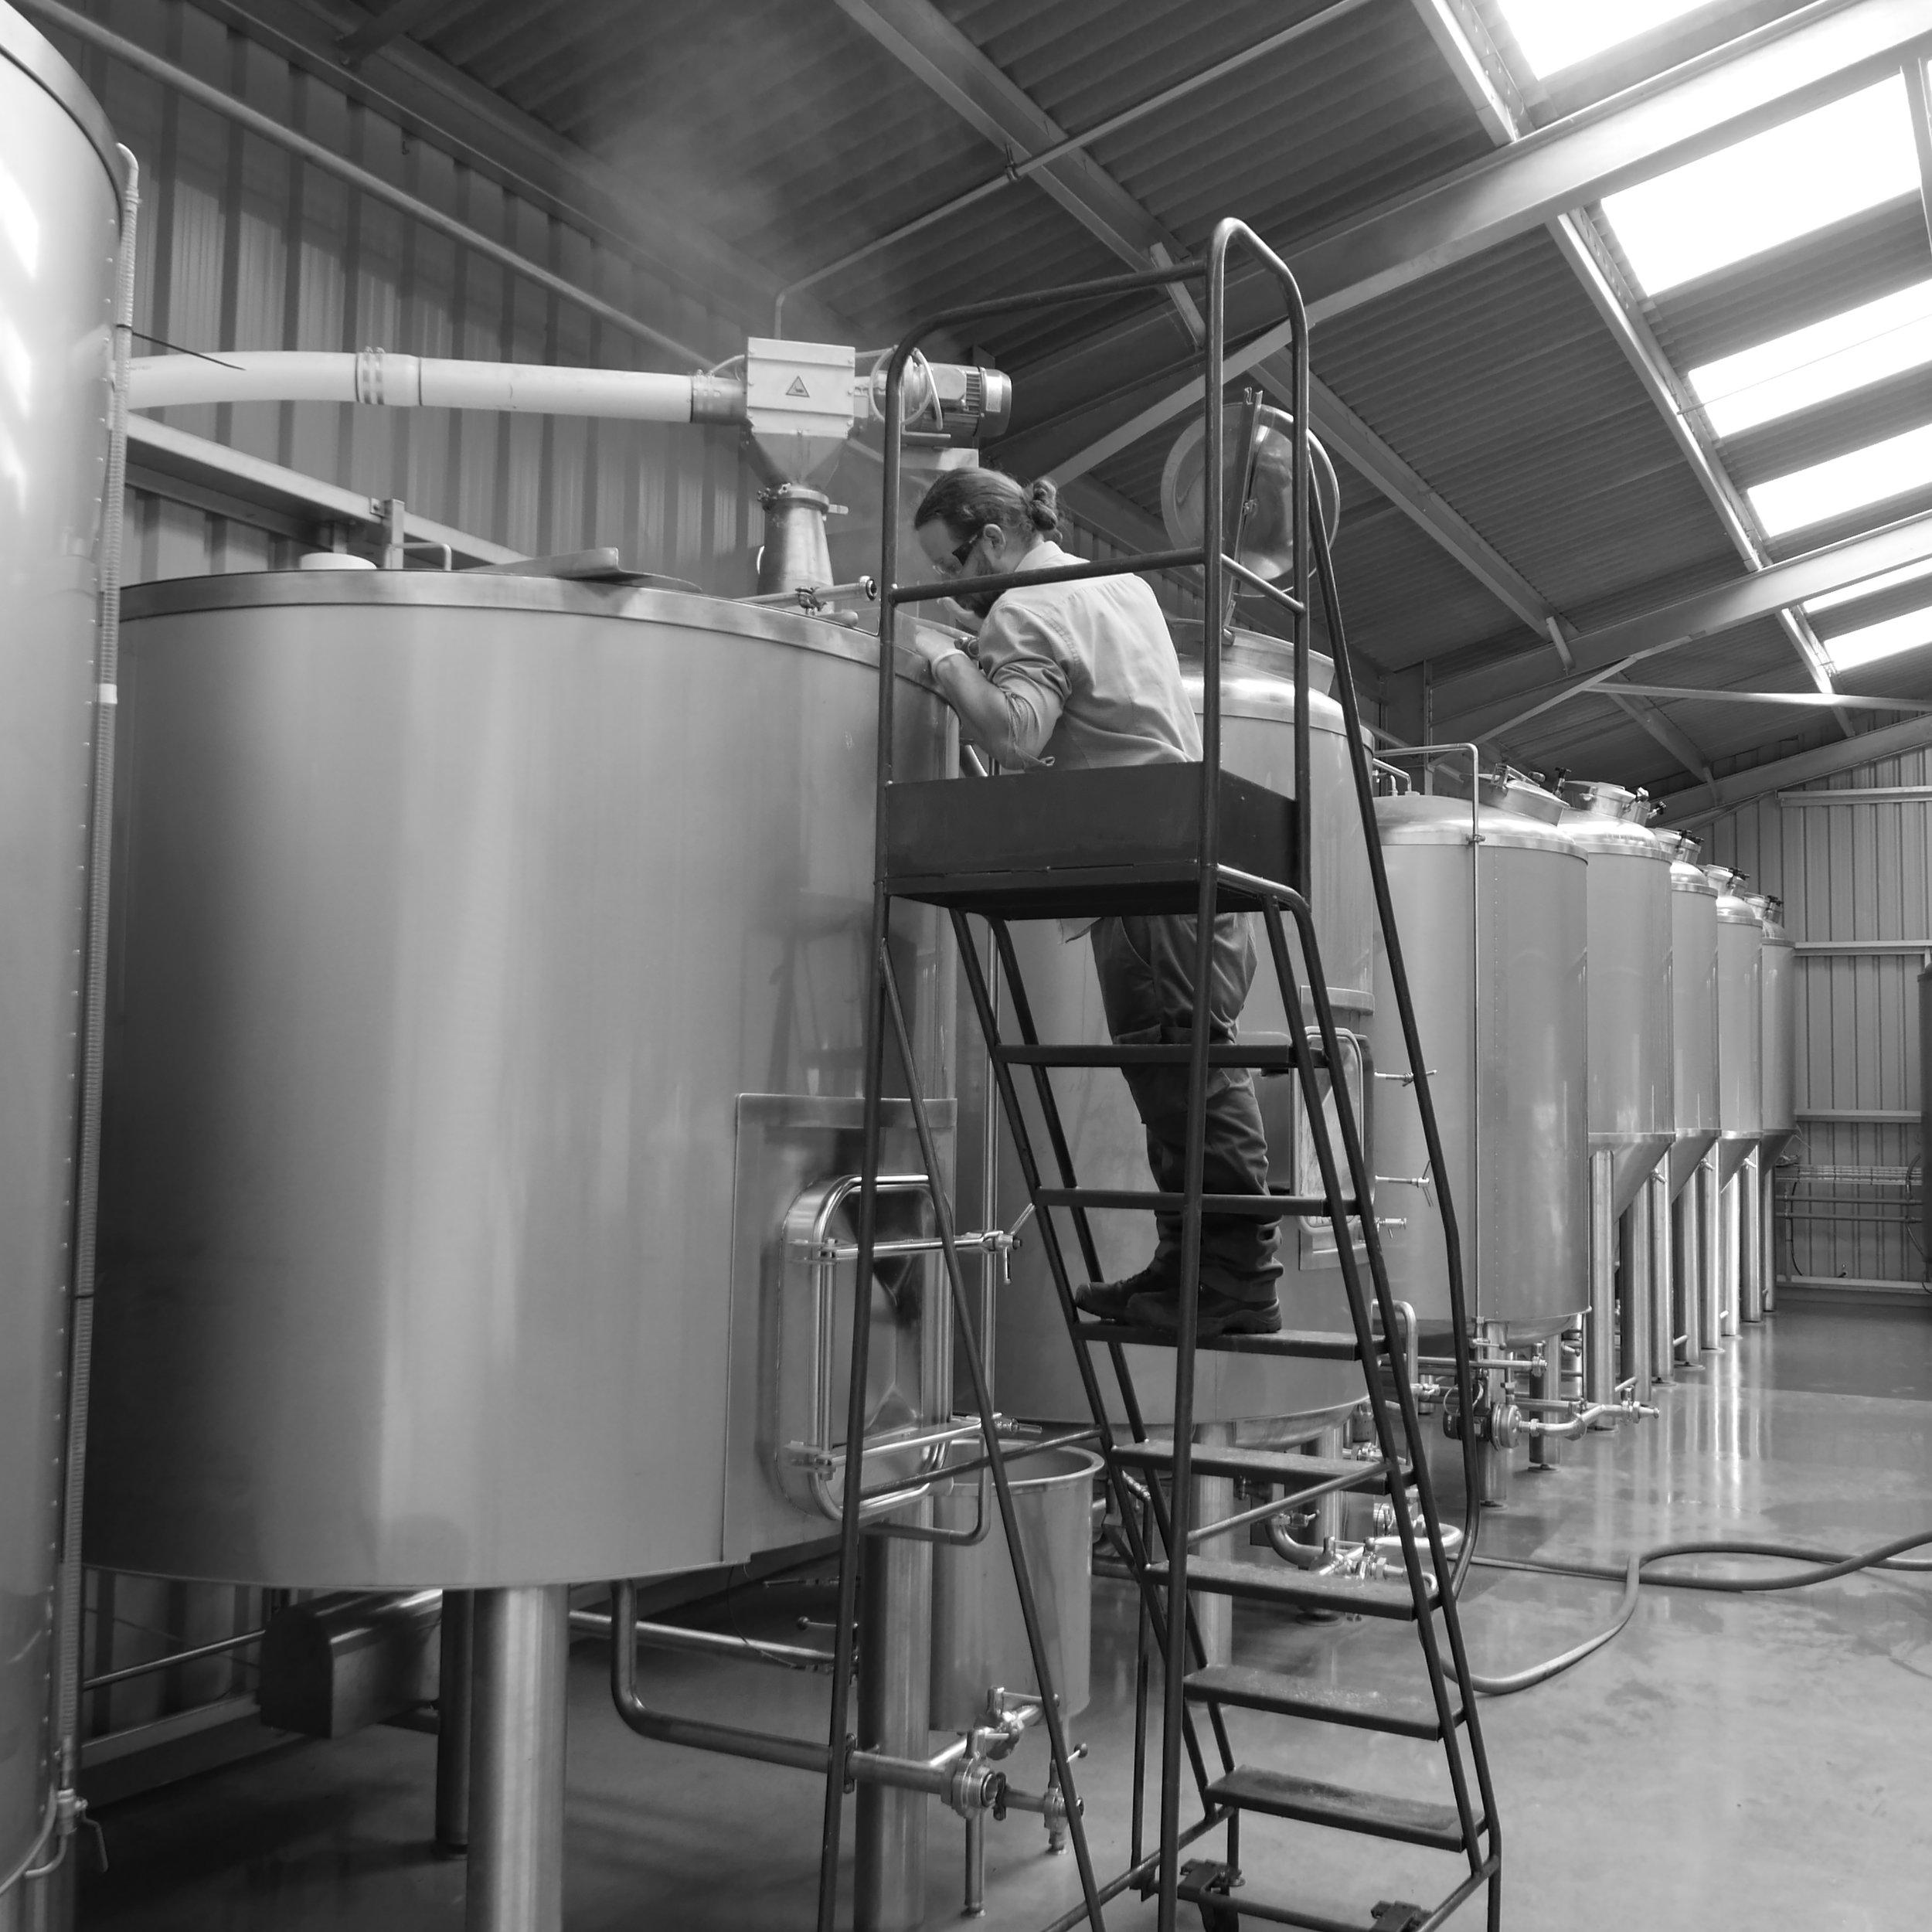 breweryL1660391.JPG